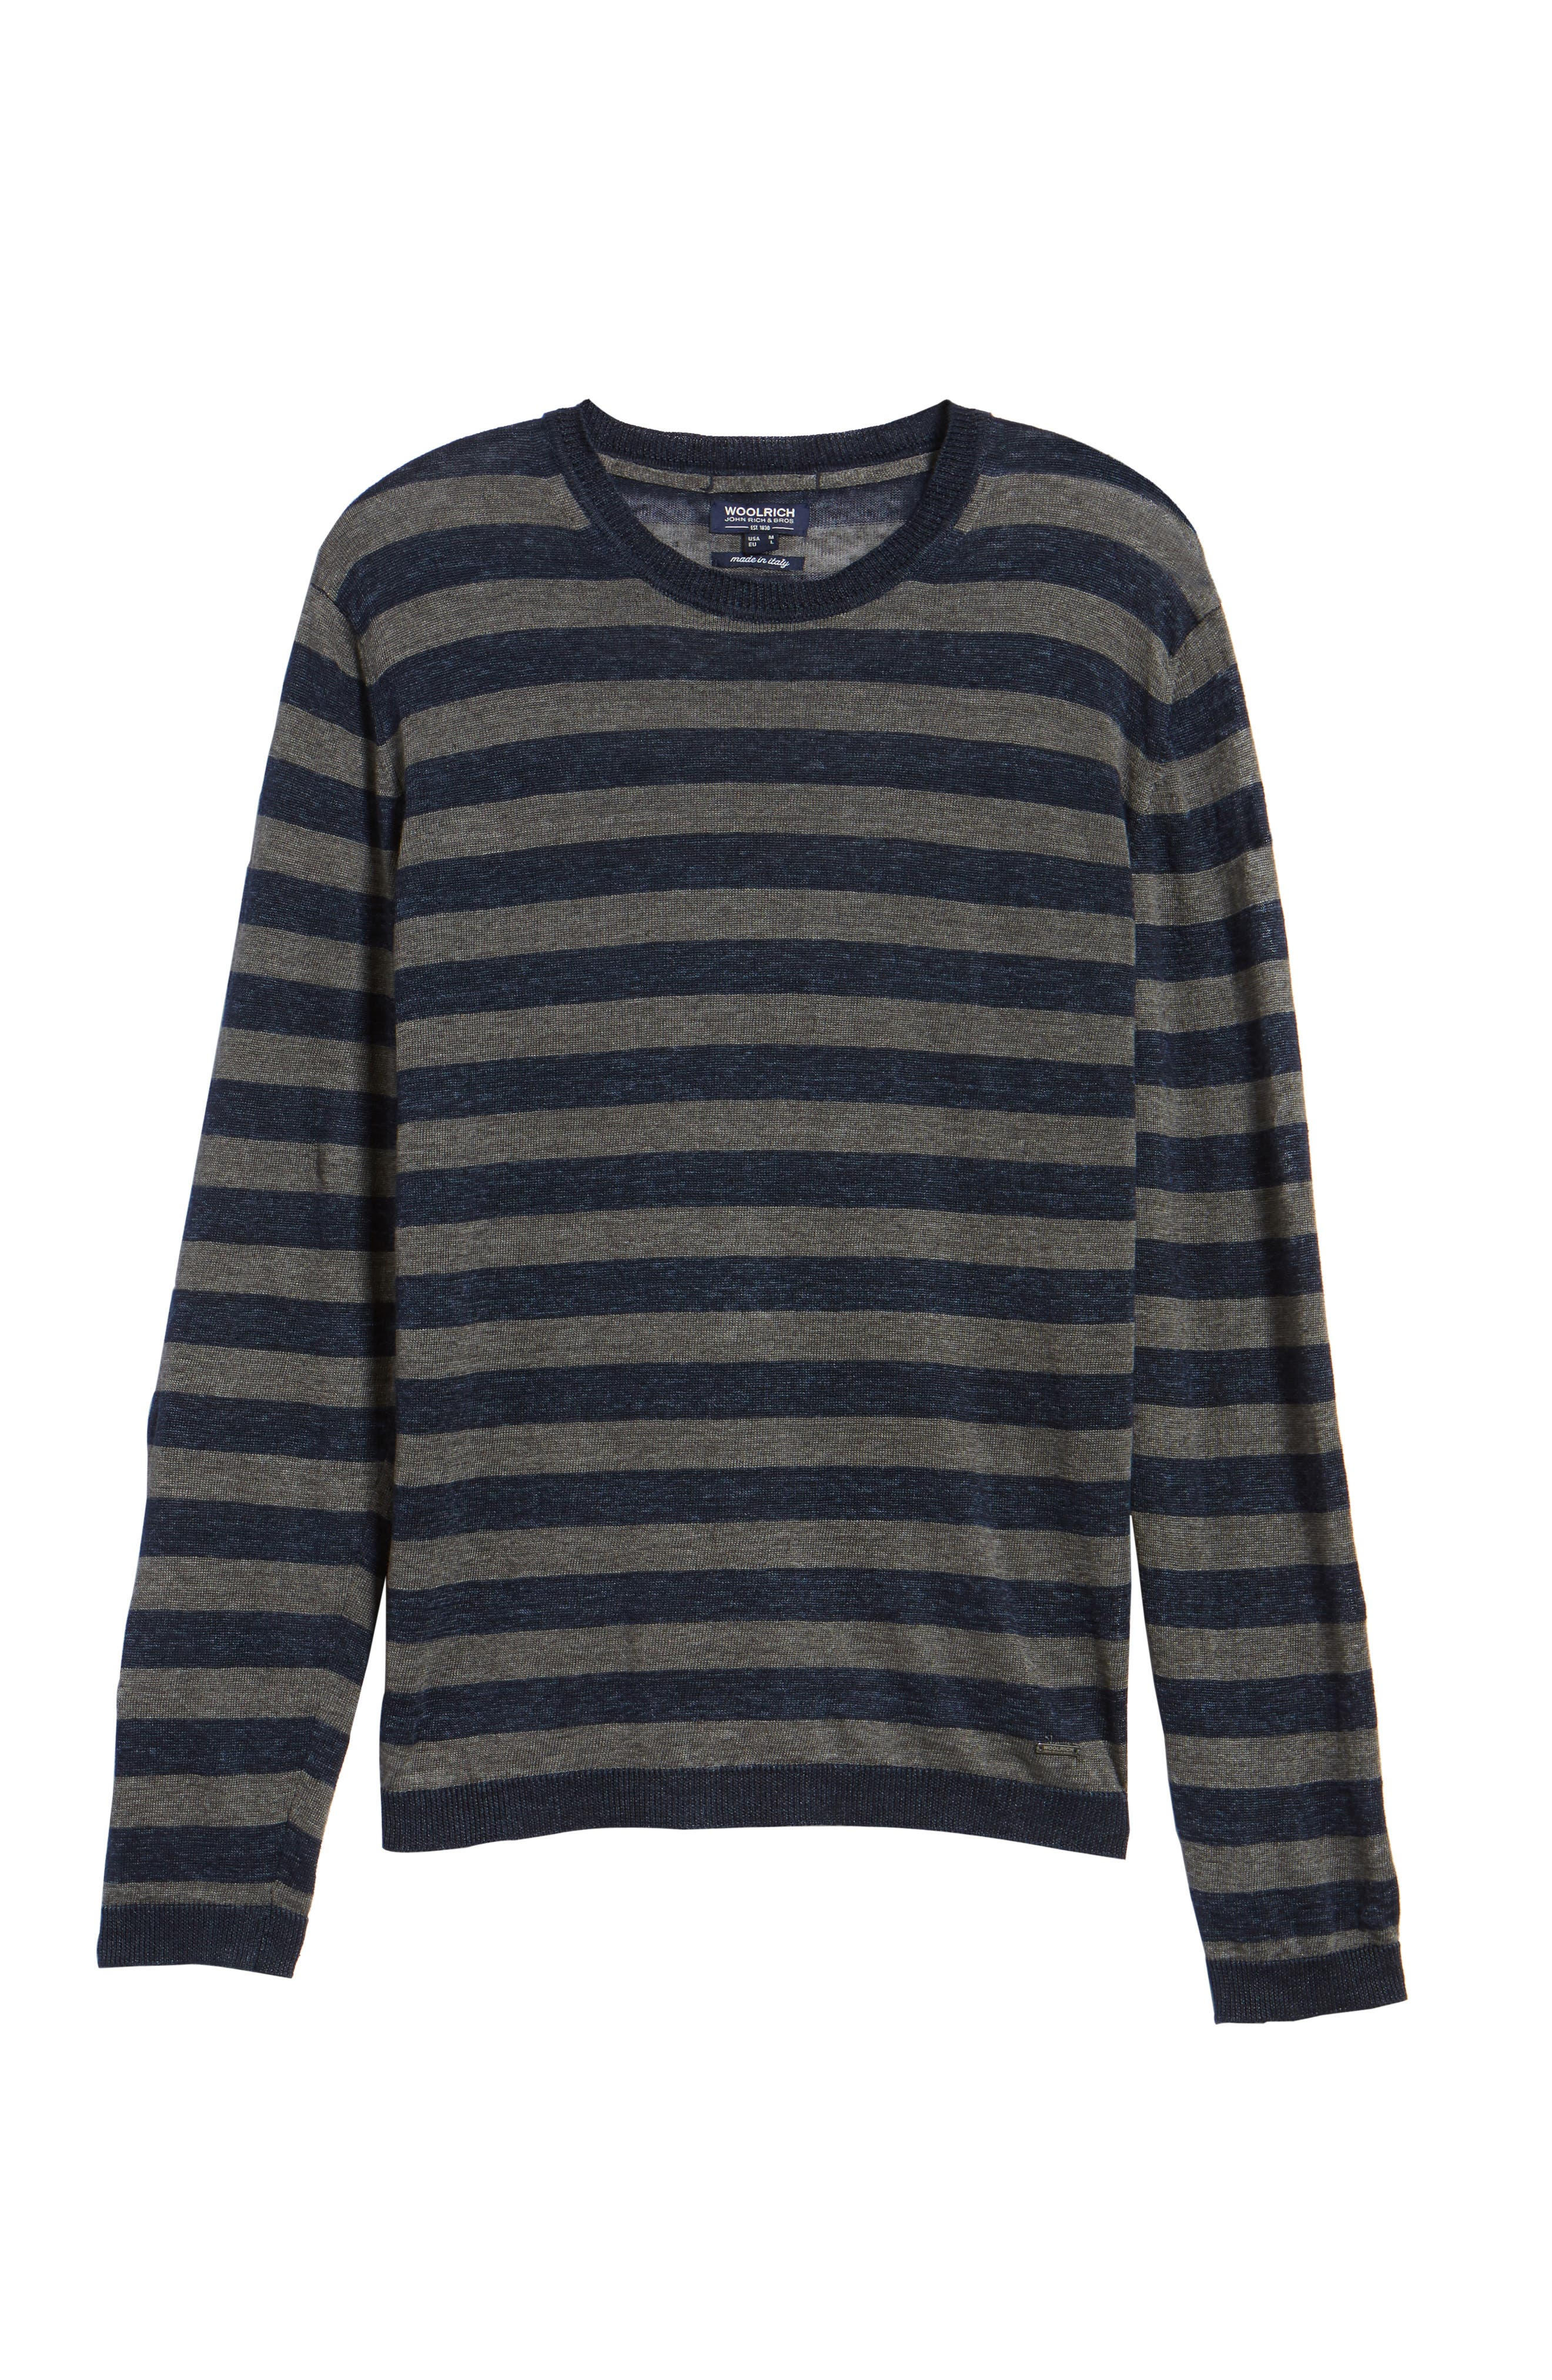 & Bros. Stripe Linen Sweater,                             Alternate thumbnail 6, color,                             Navy Stripe